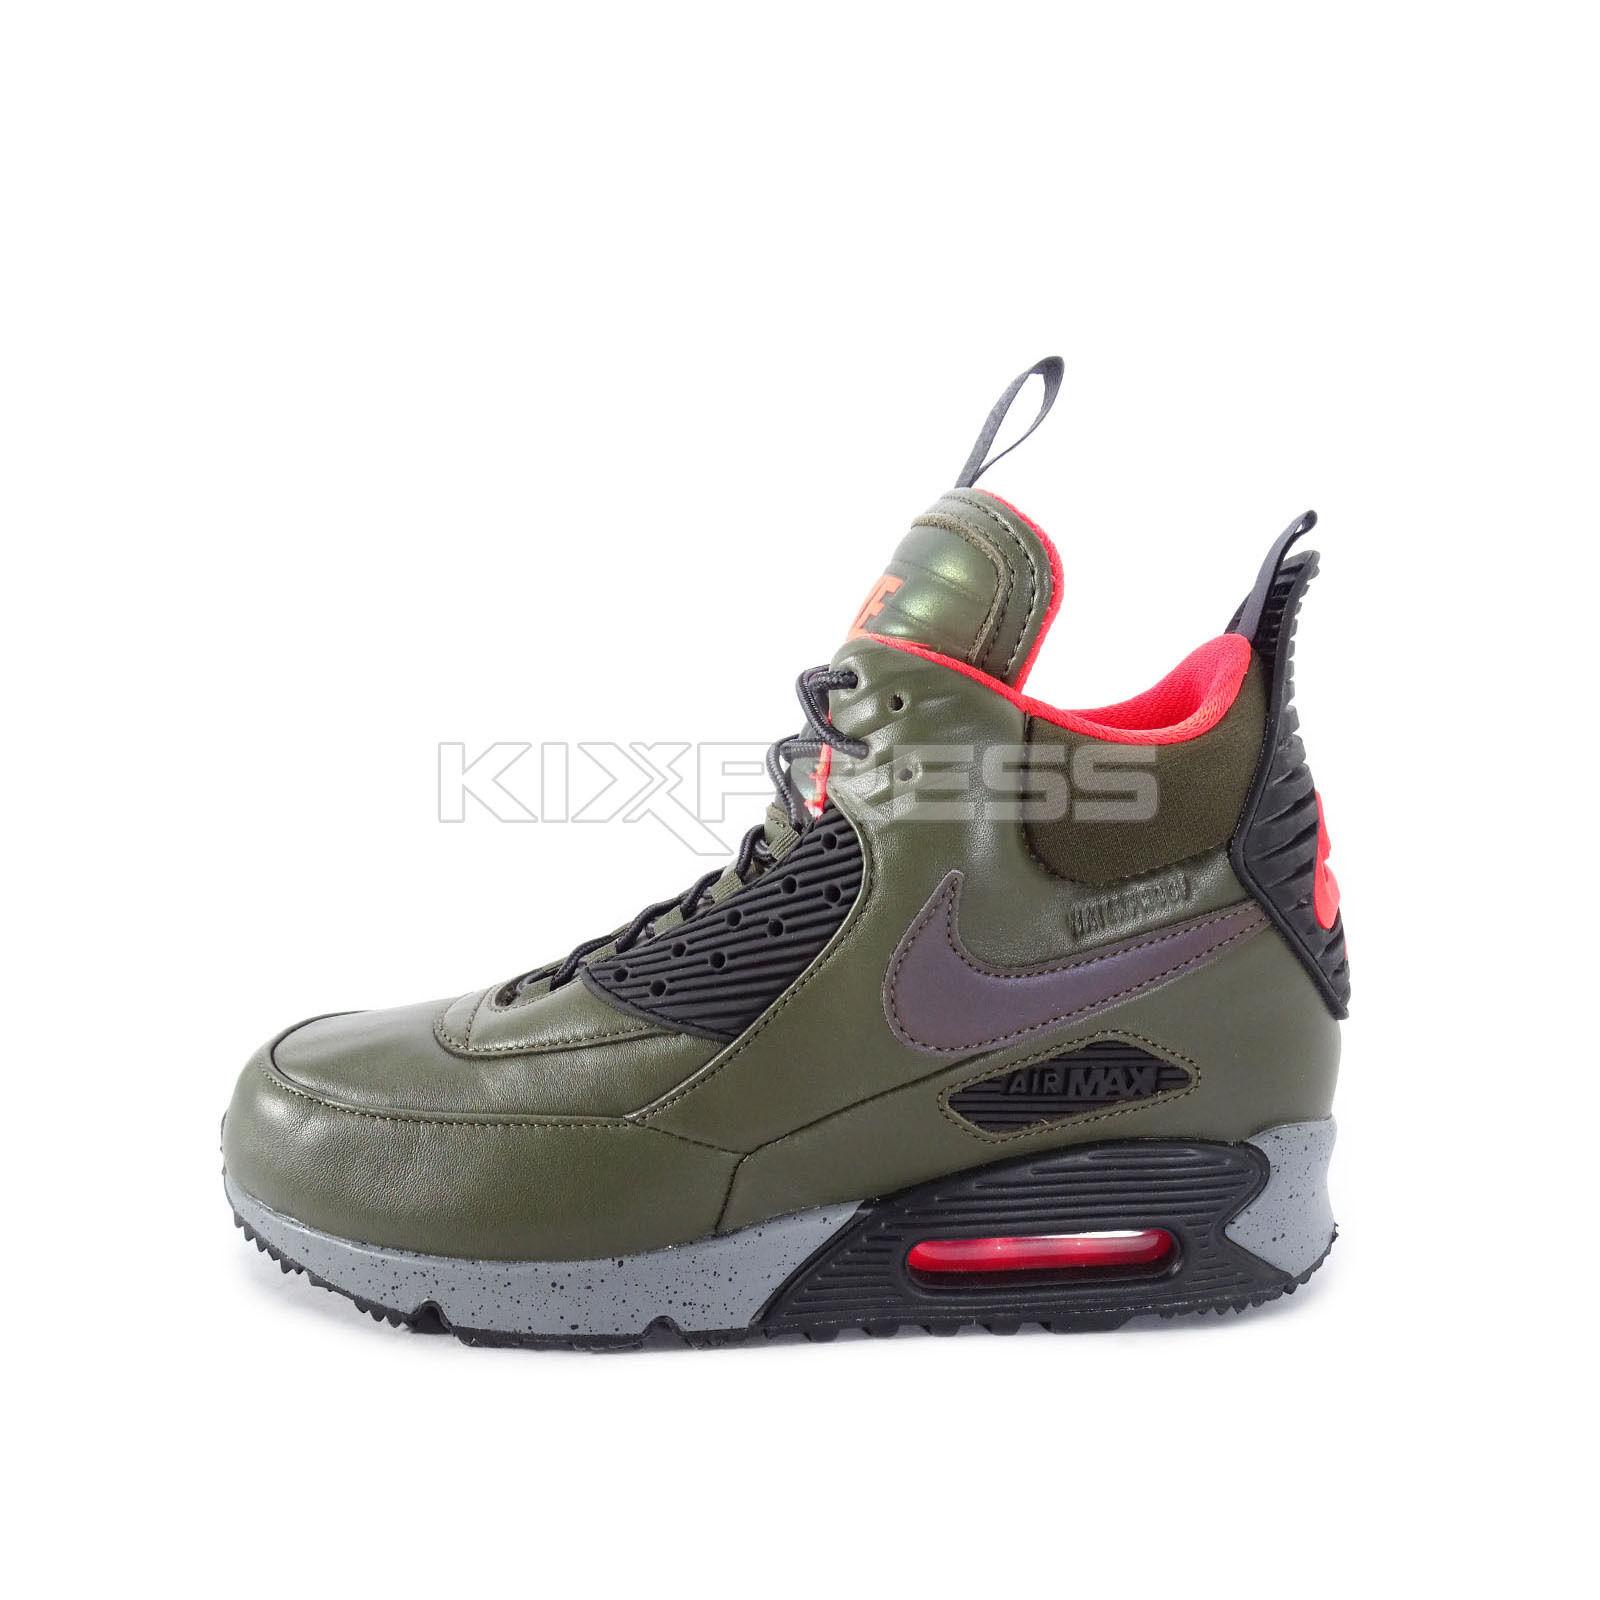 51e6d28470 Nike Air Max 90 Sneakerboot Winter [684714-300] NSW Casual Dark Loden/